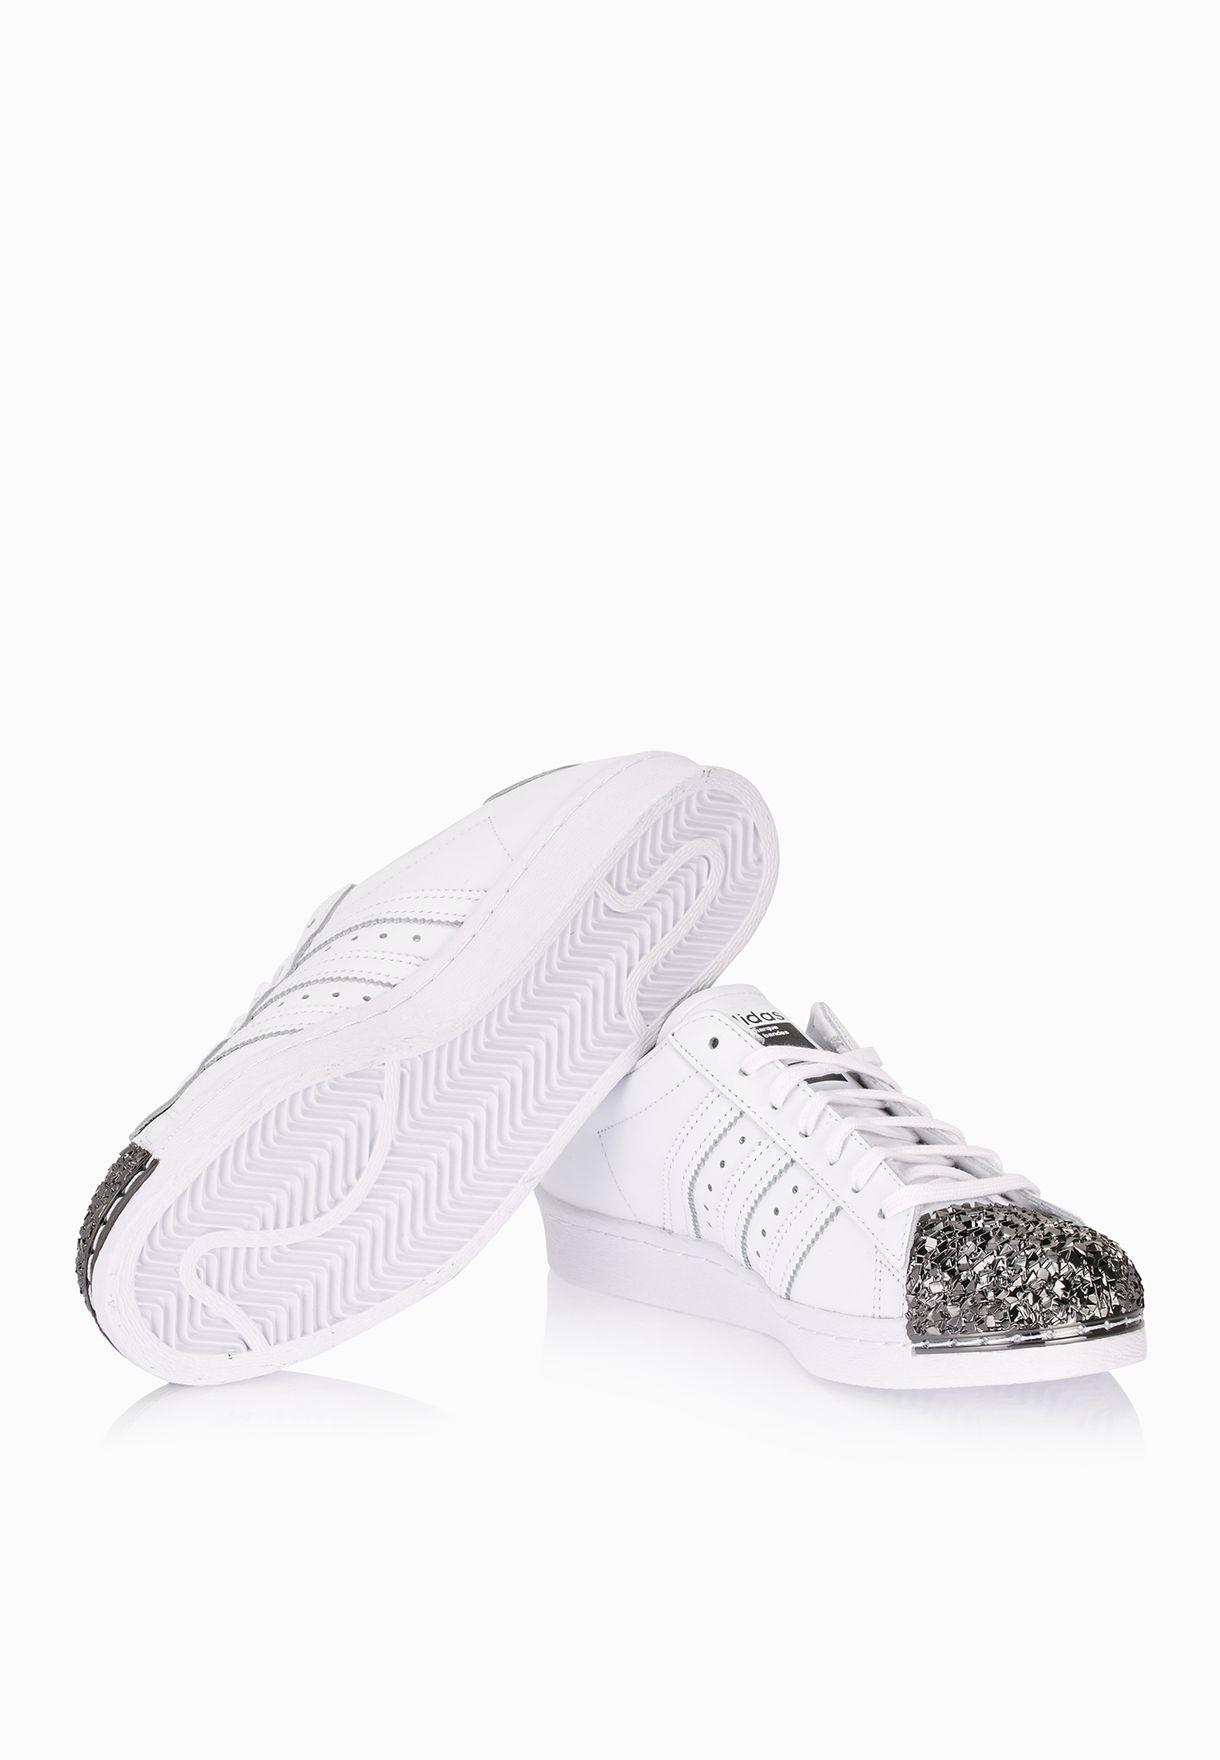 d4ef6189dfff42 Shop adidas Originals white Superstar 80s Metal Toe Cap S76532 for ...